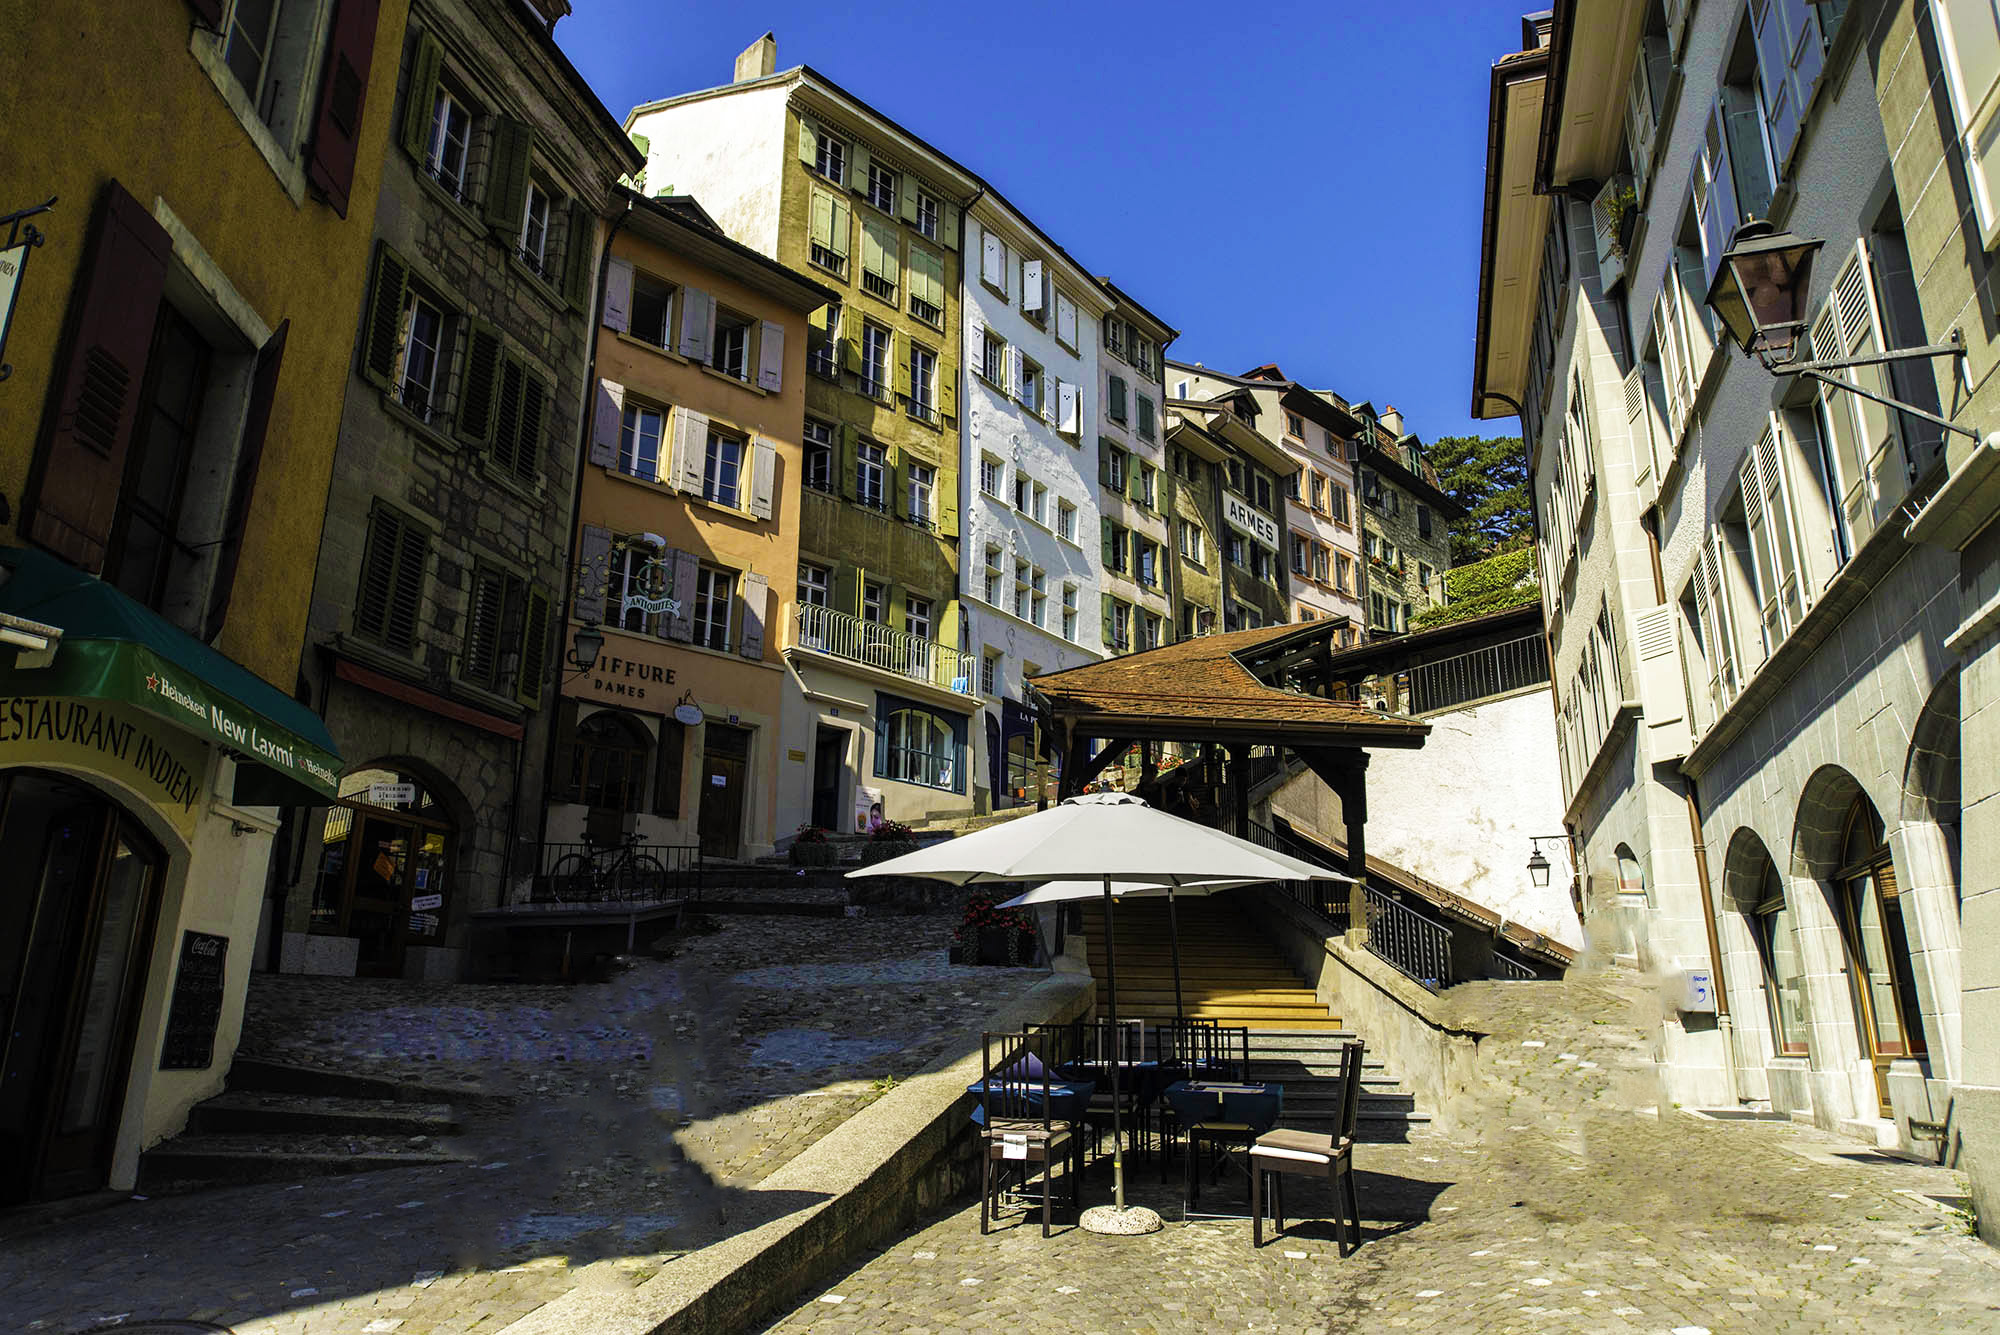 kt_2020_300_Keytours_excursions_Swisstours_lausanne_city2_2000_10